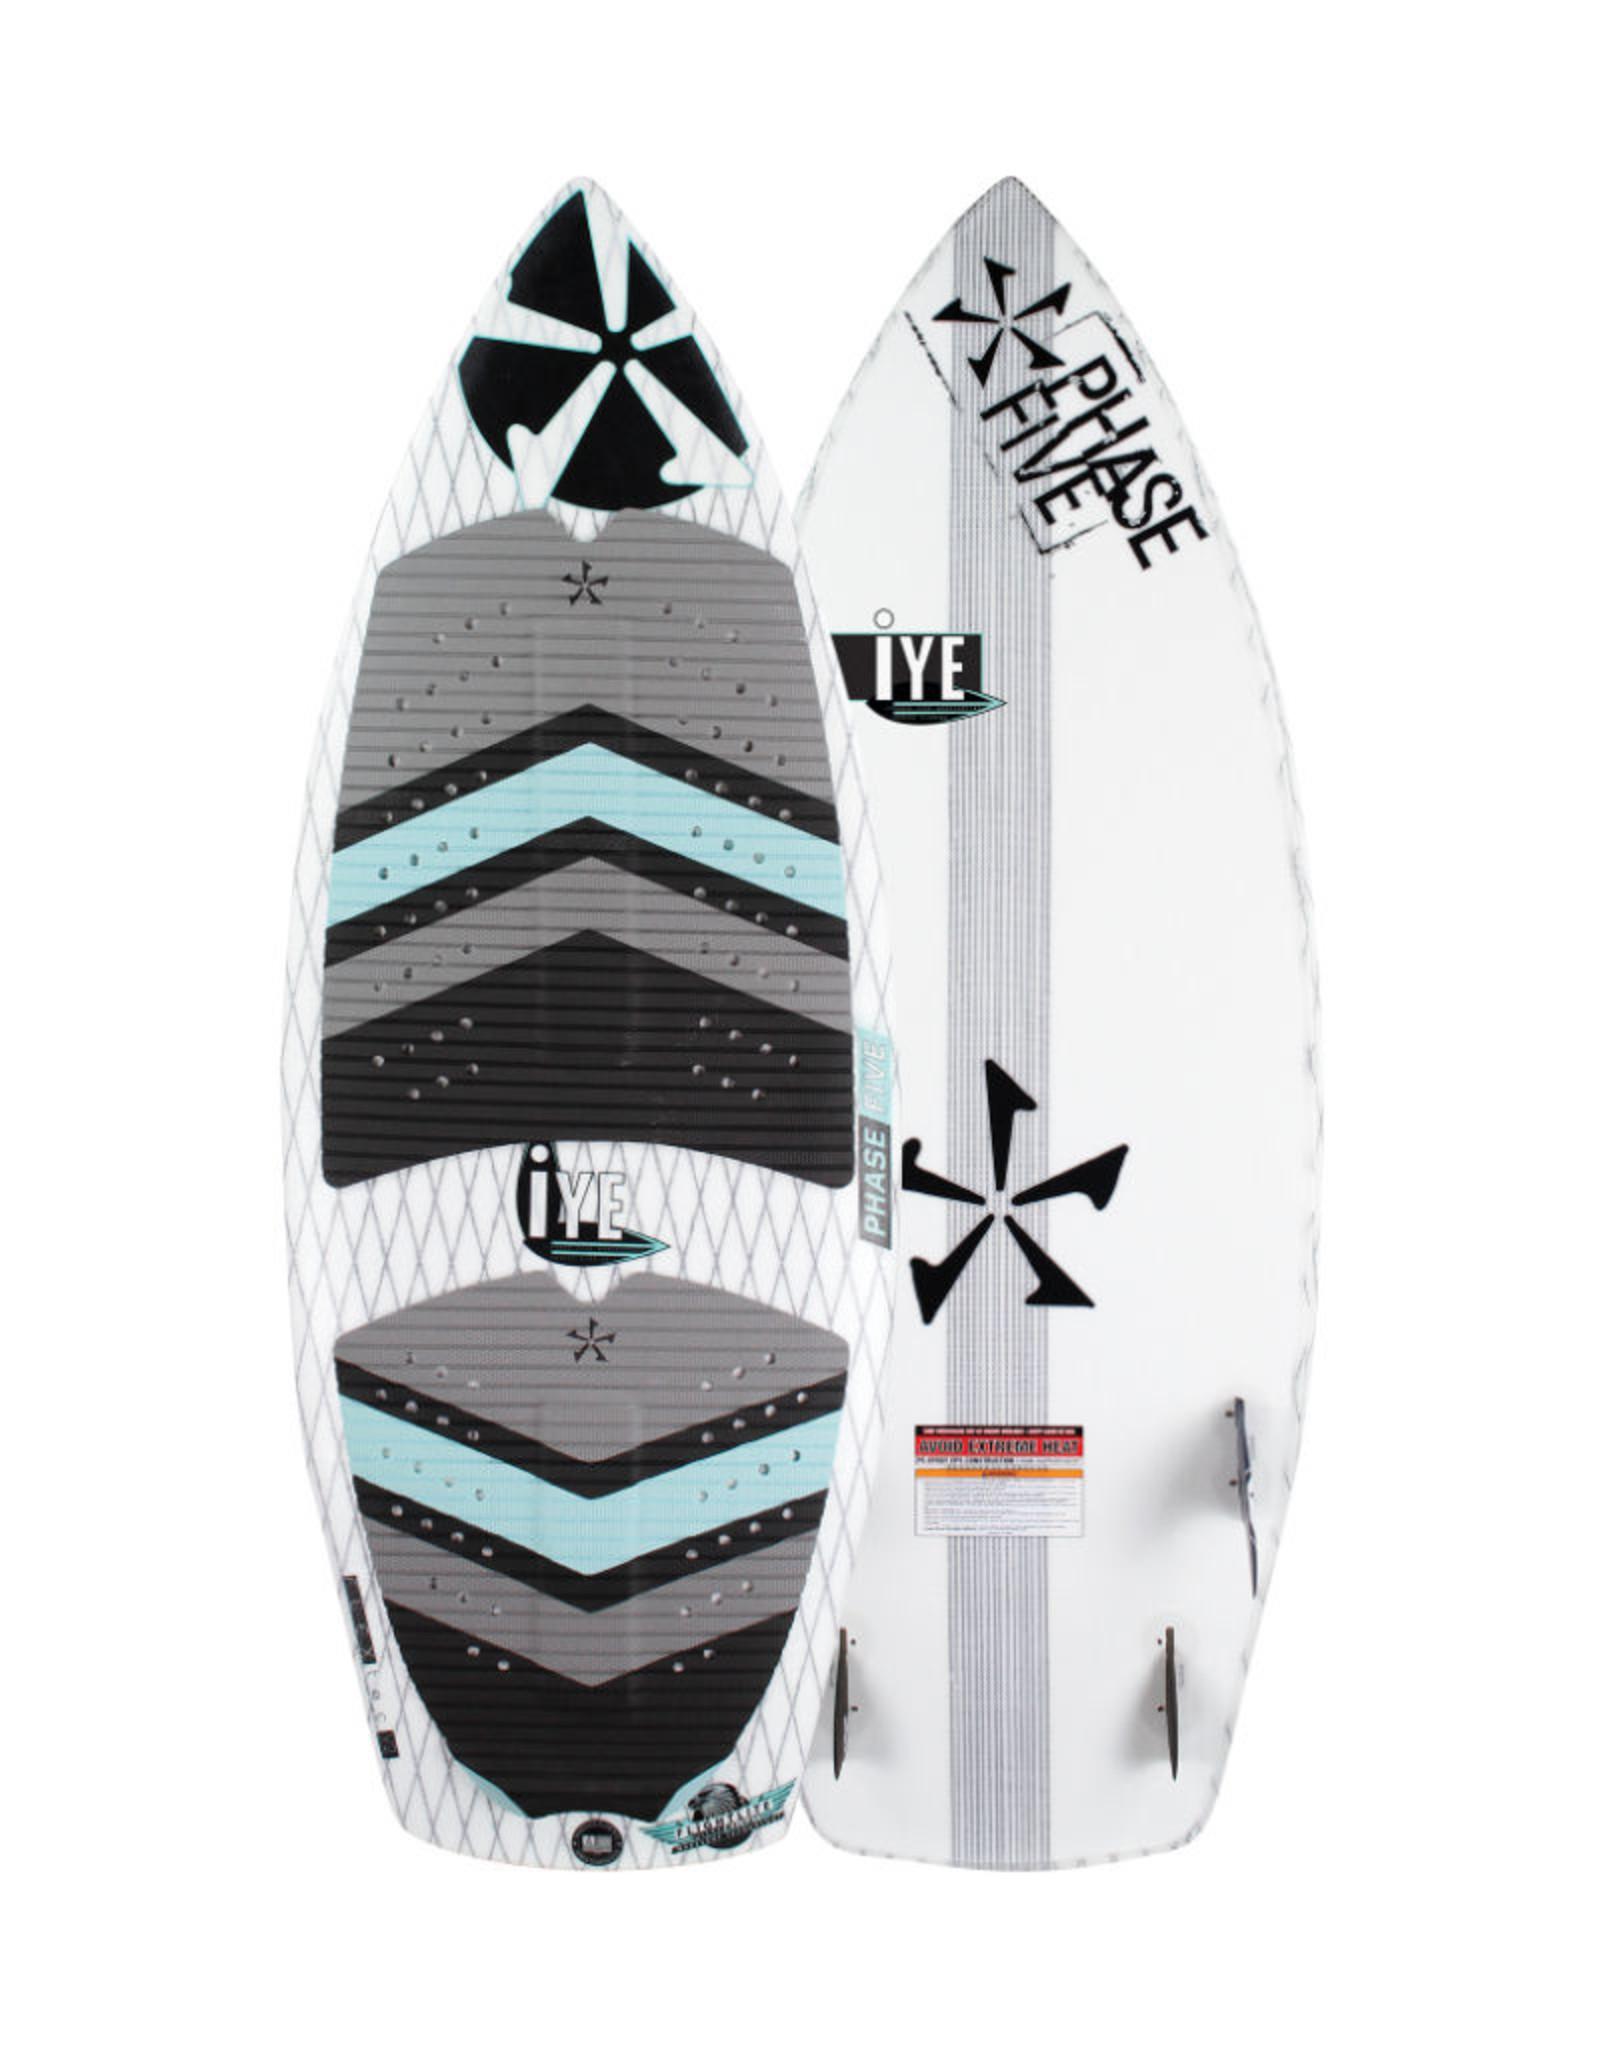 "Phase Five Phase Five Iye 49"" Youth Surf Style Wakesurf Demo Board"